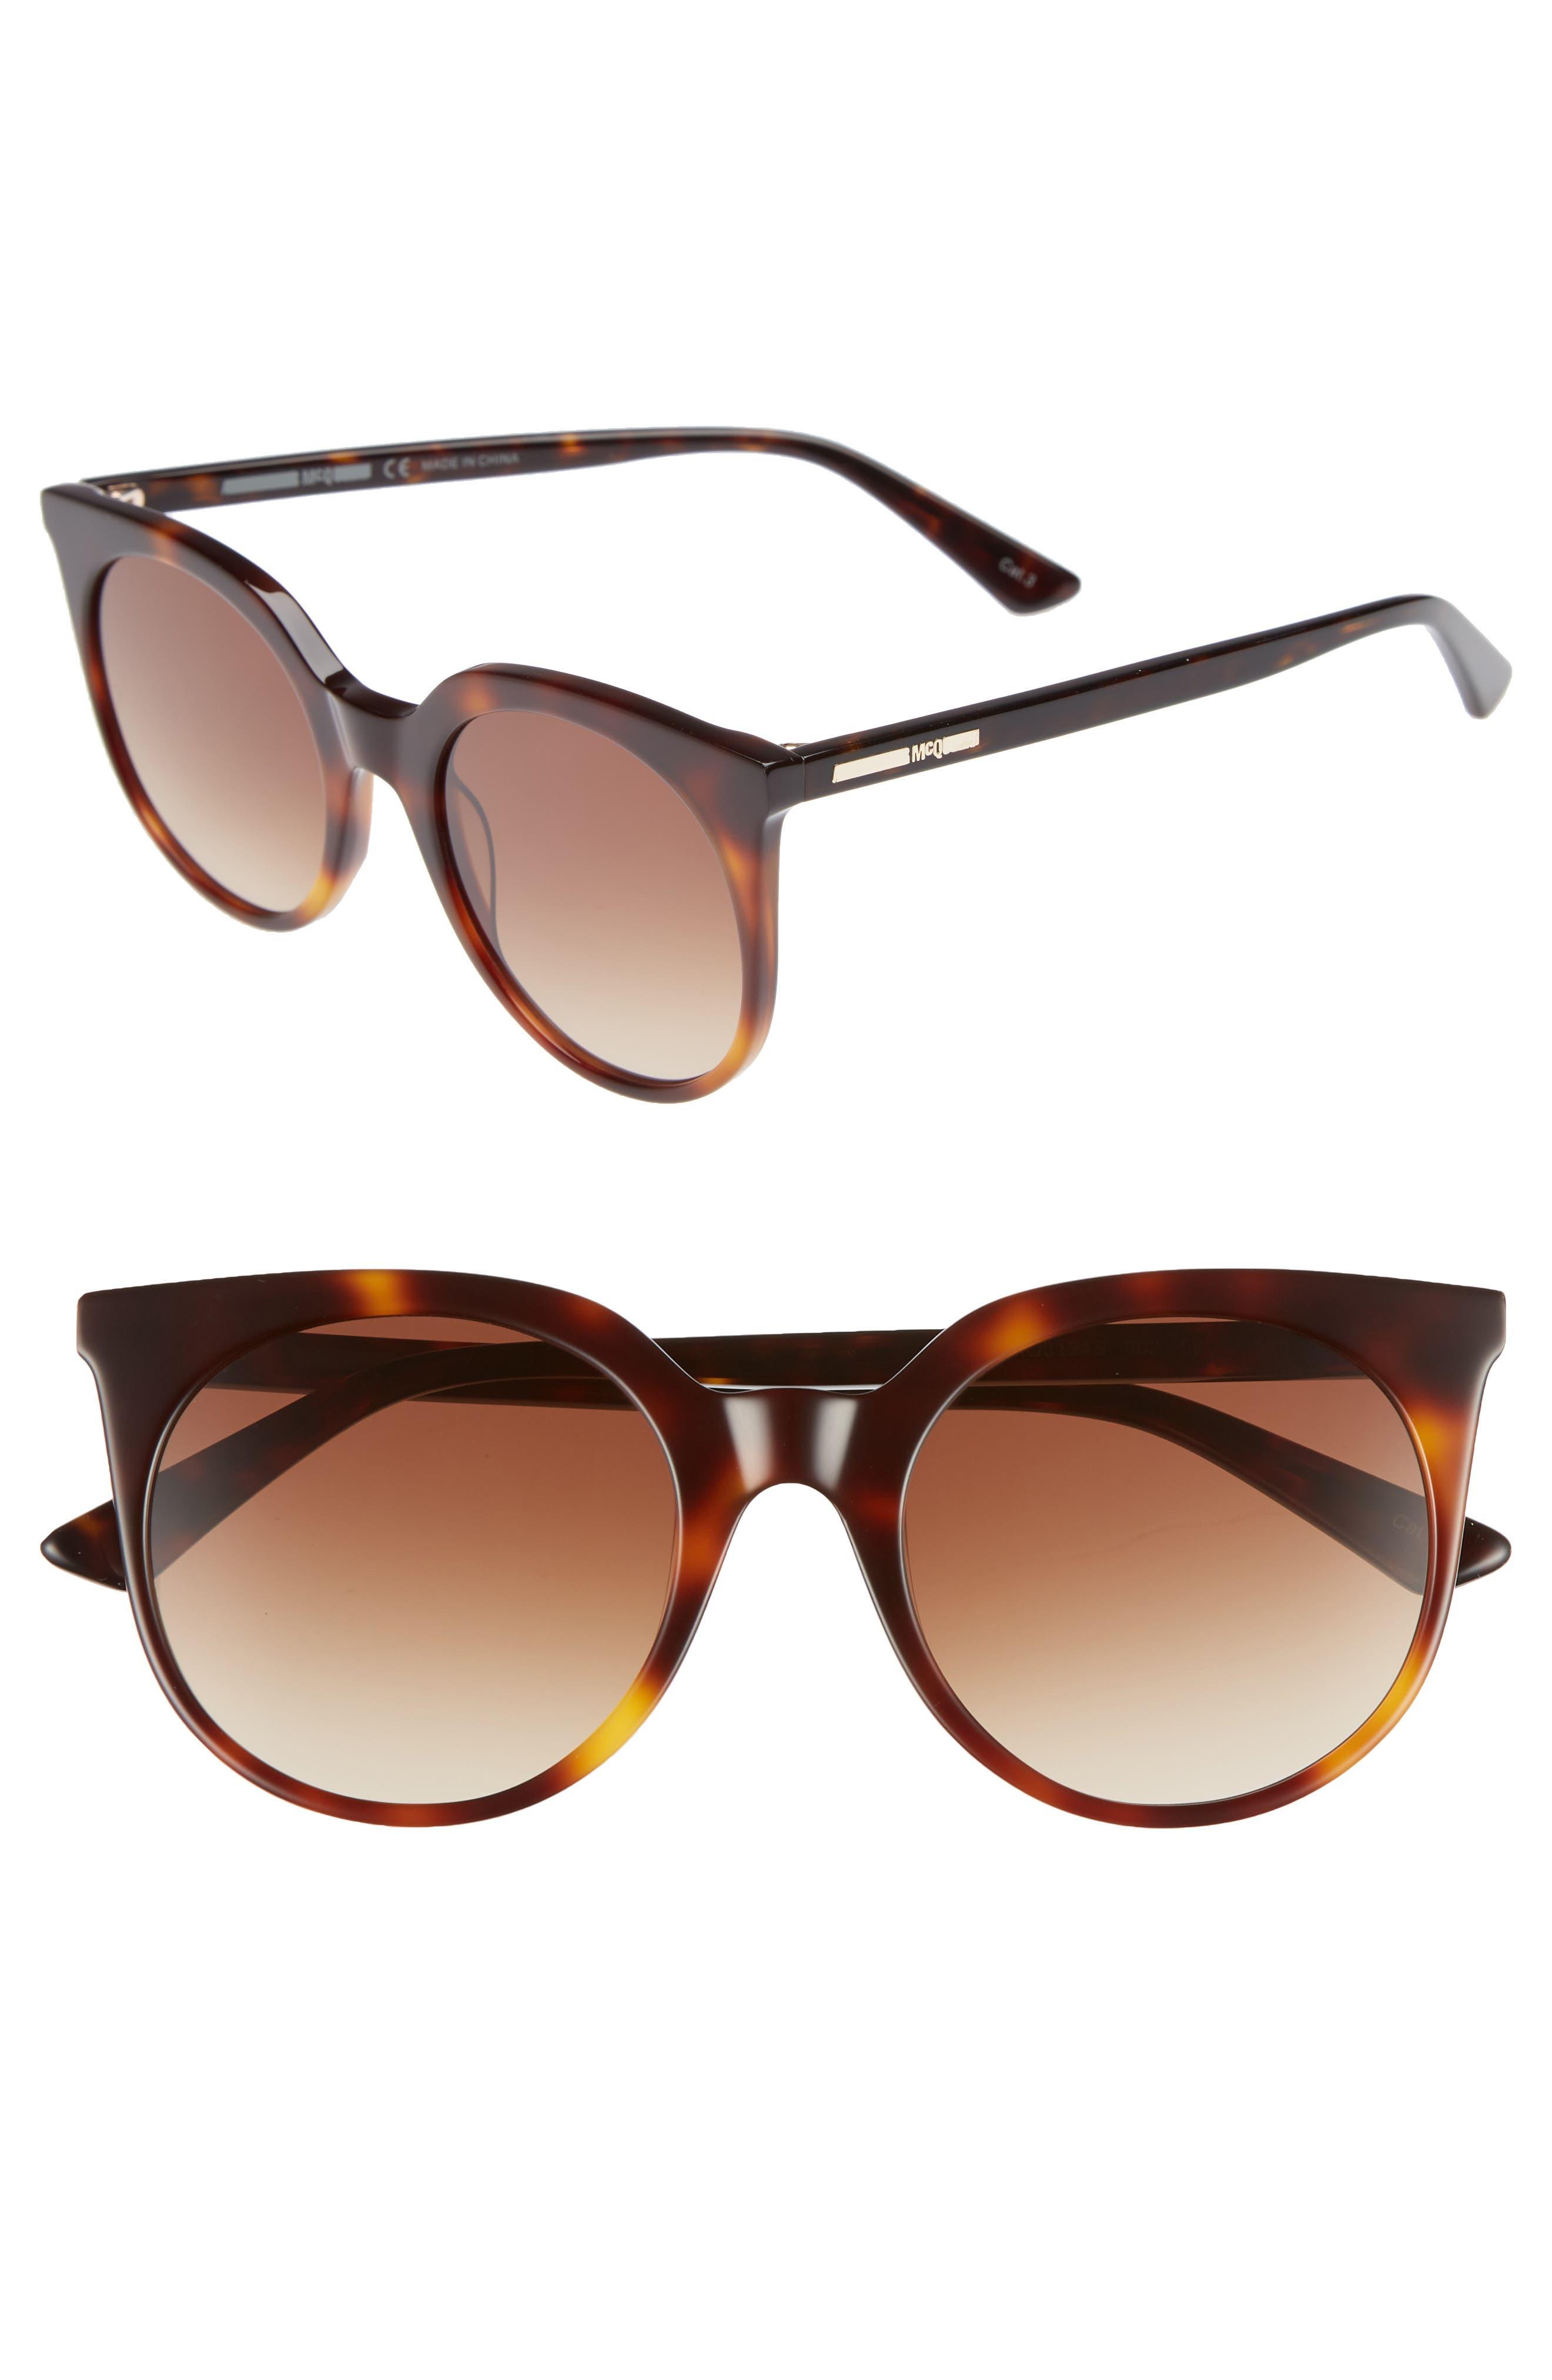 MCQ ALEXANDER MCQUEEN, 52mm Cat Eye Sunglasses, Main thumbnail 1, color, HAVANA